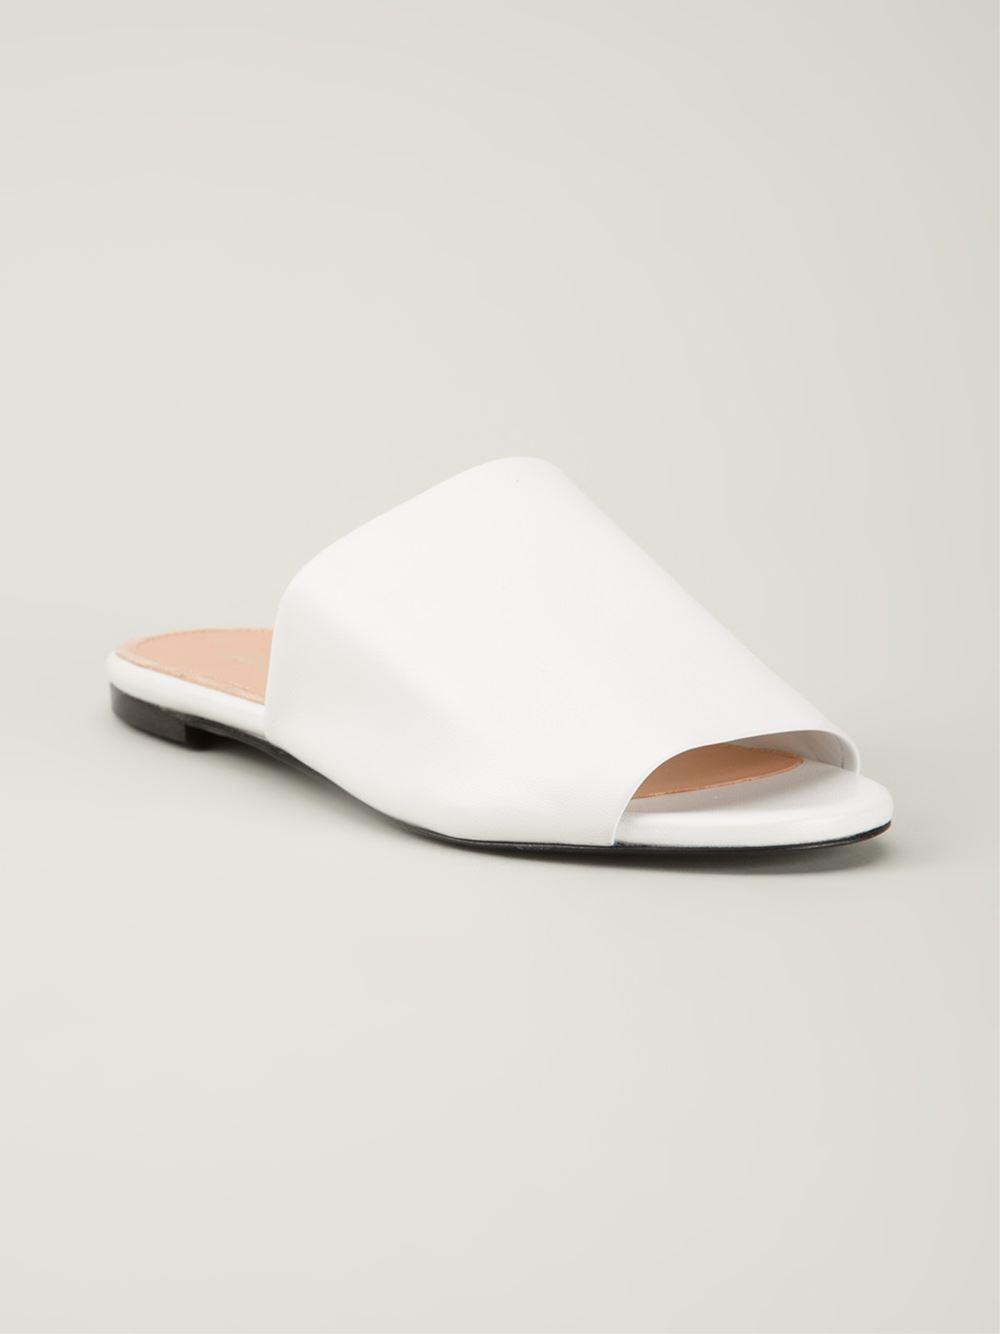 Robert Clergerie Flat Slide Sandals In White Lyst